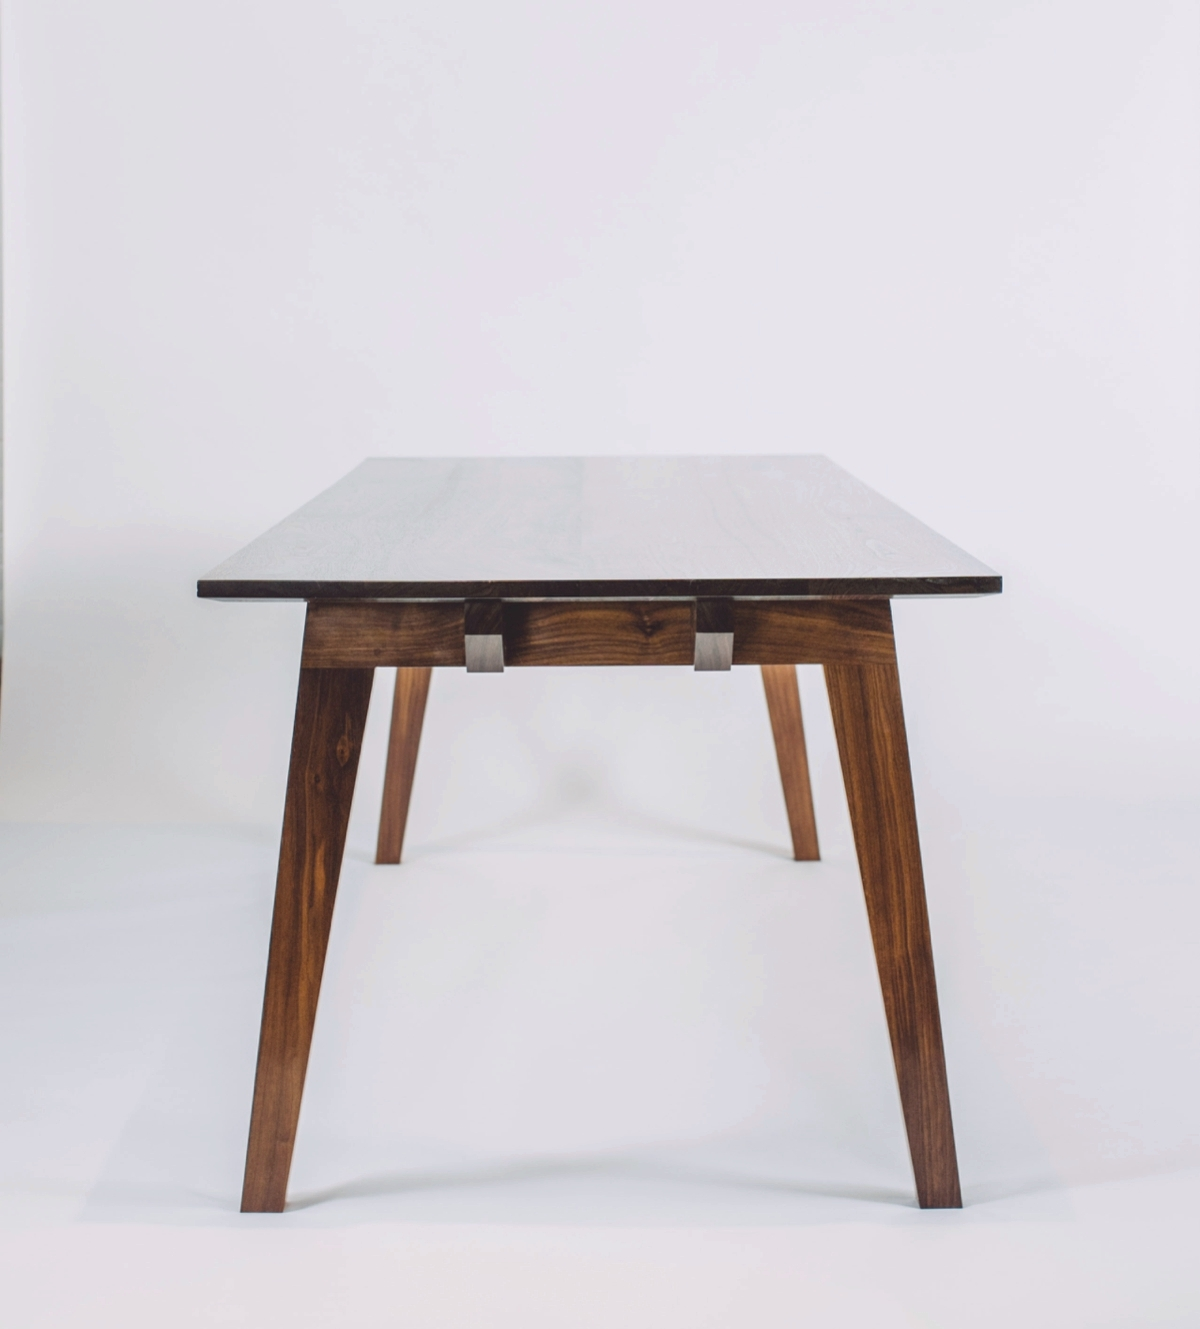 skana table_183650.jpg